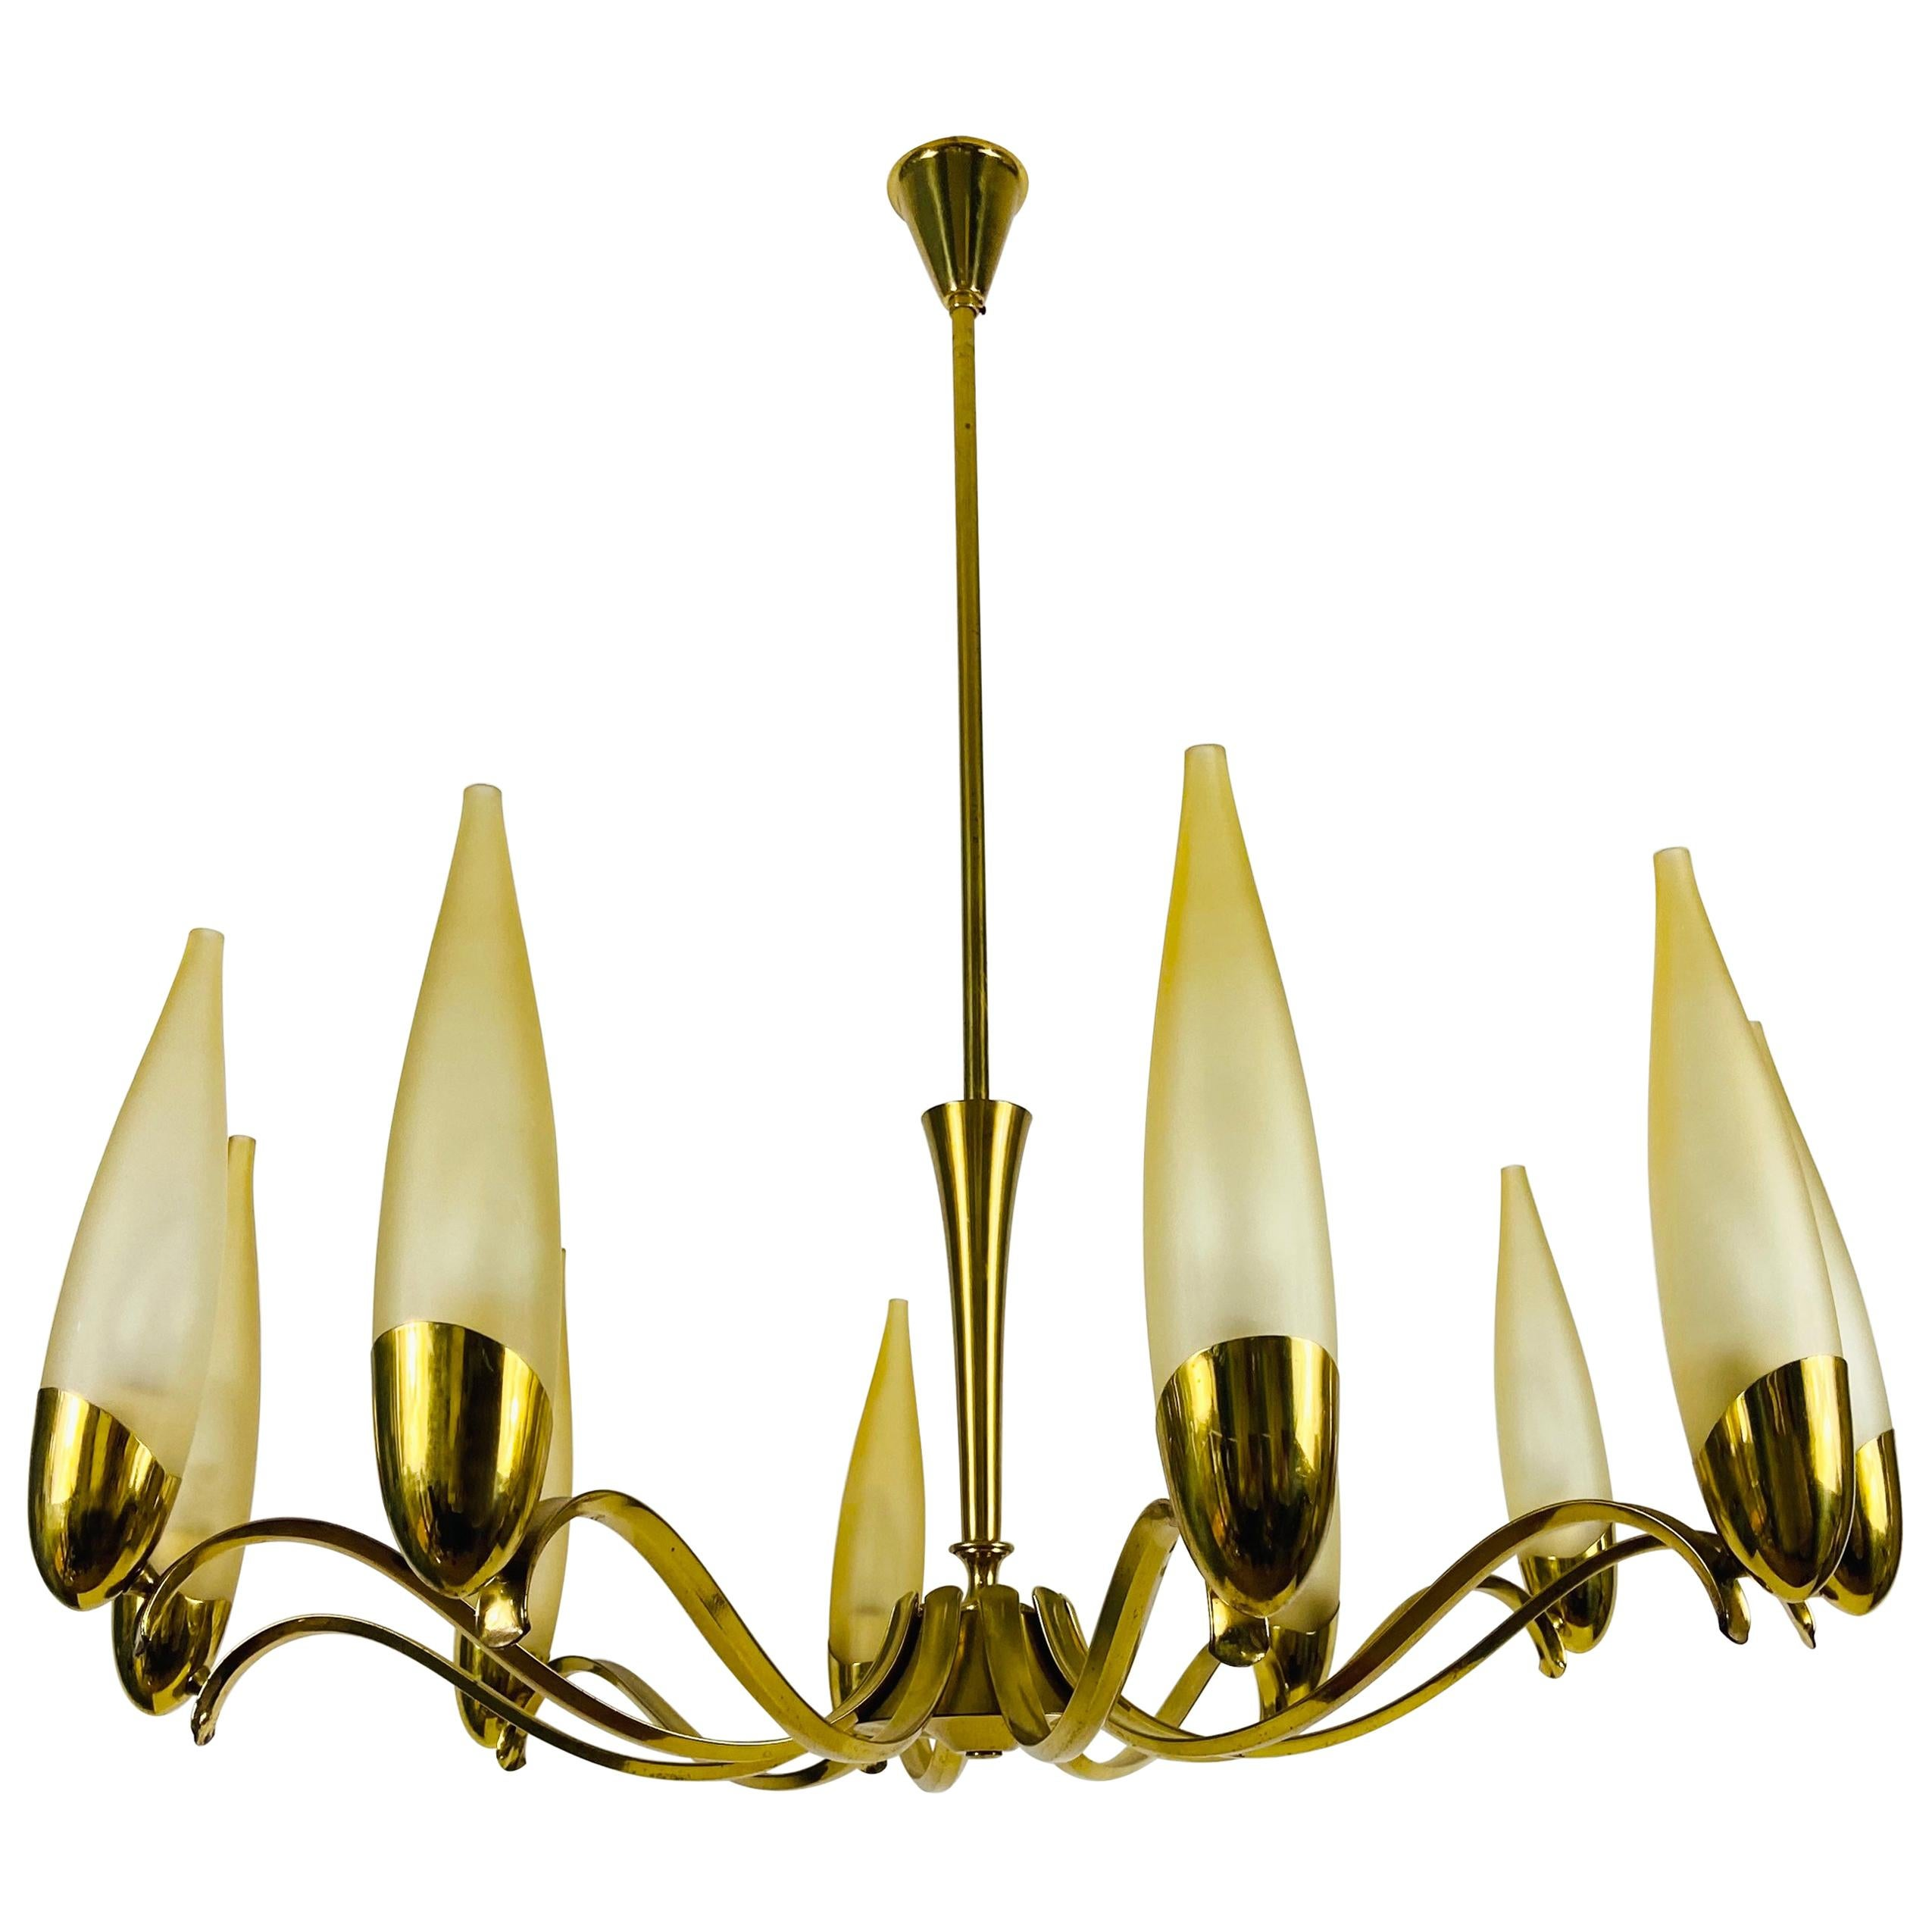 Mid-Century Modern Italian Brass and Glass Chandelier, 1960s